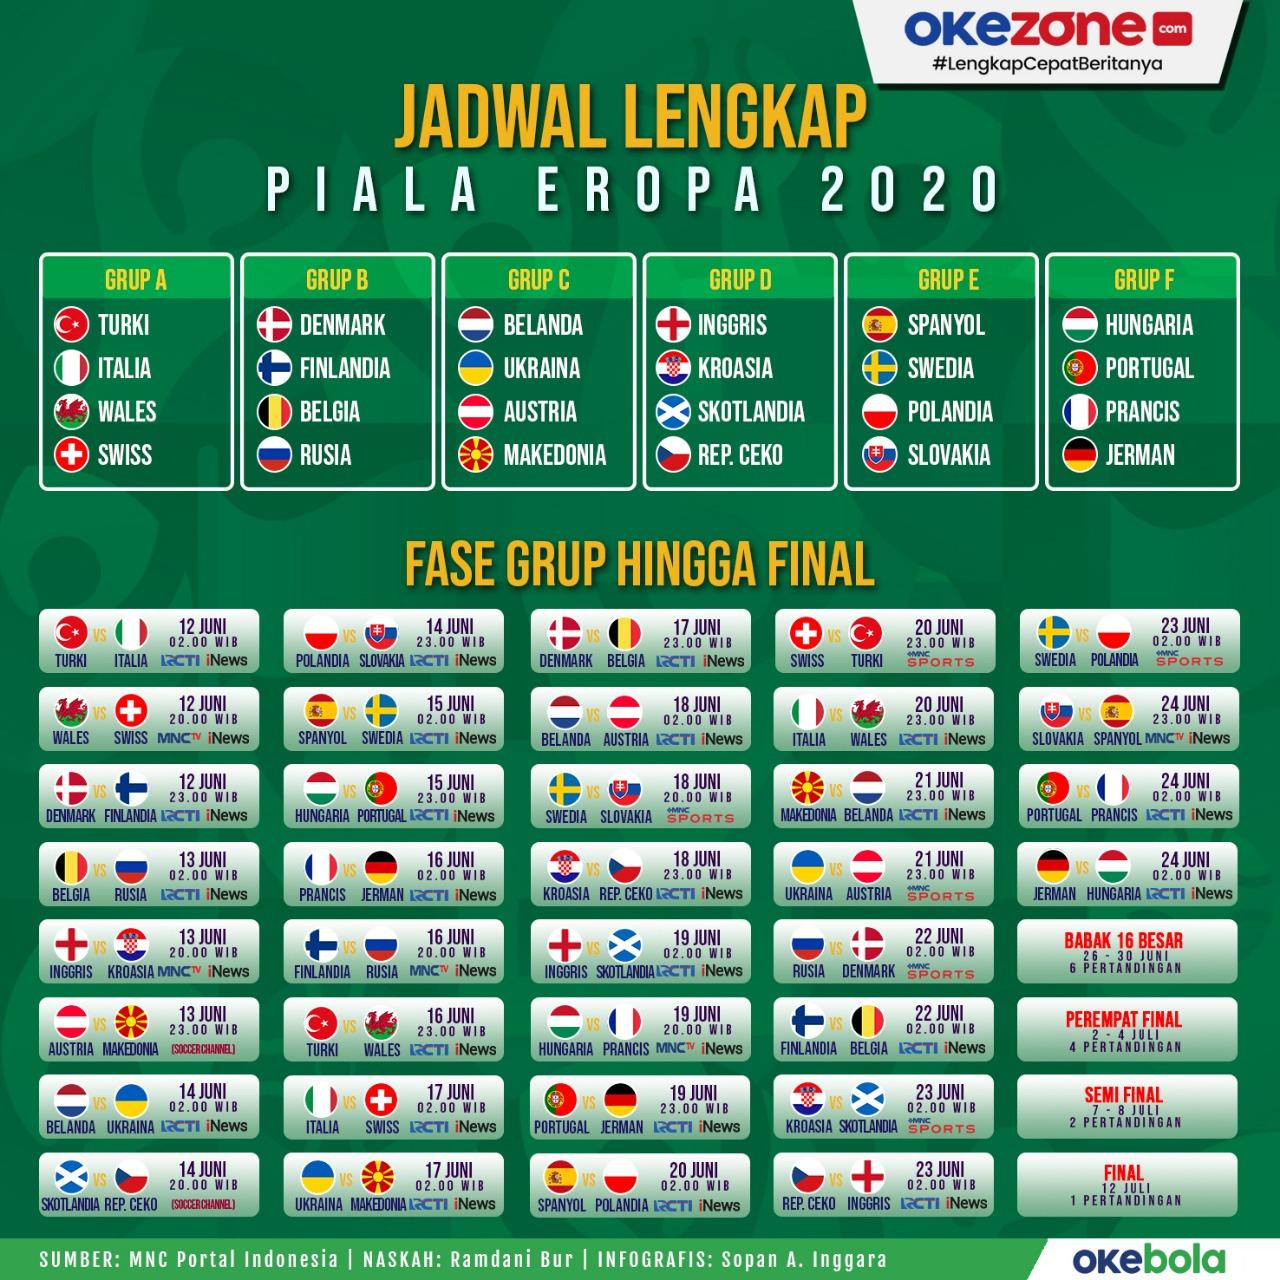 Jadwal Lengkap Piala Eropa 2020 -